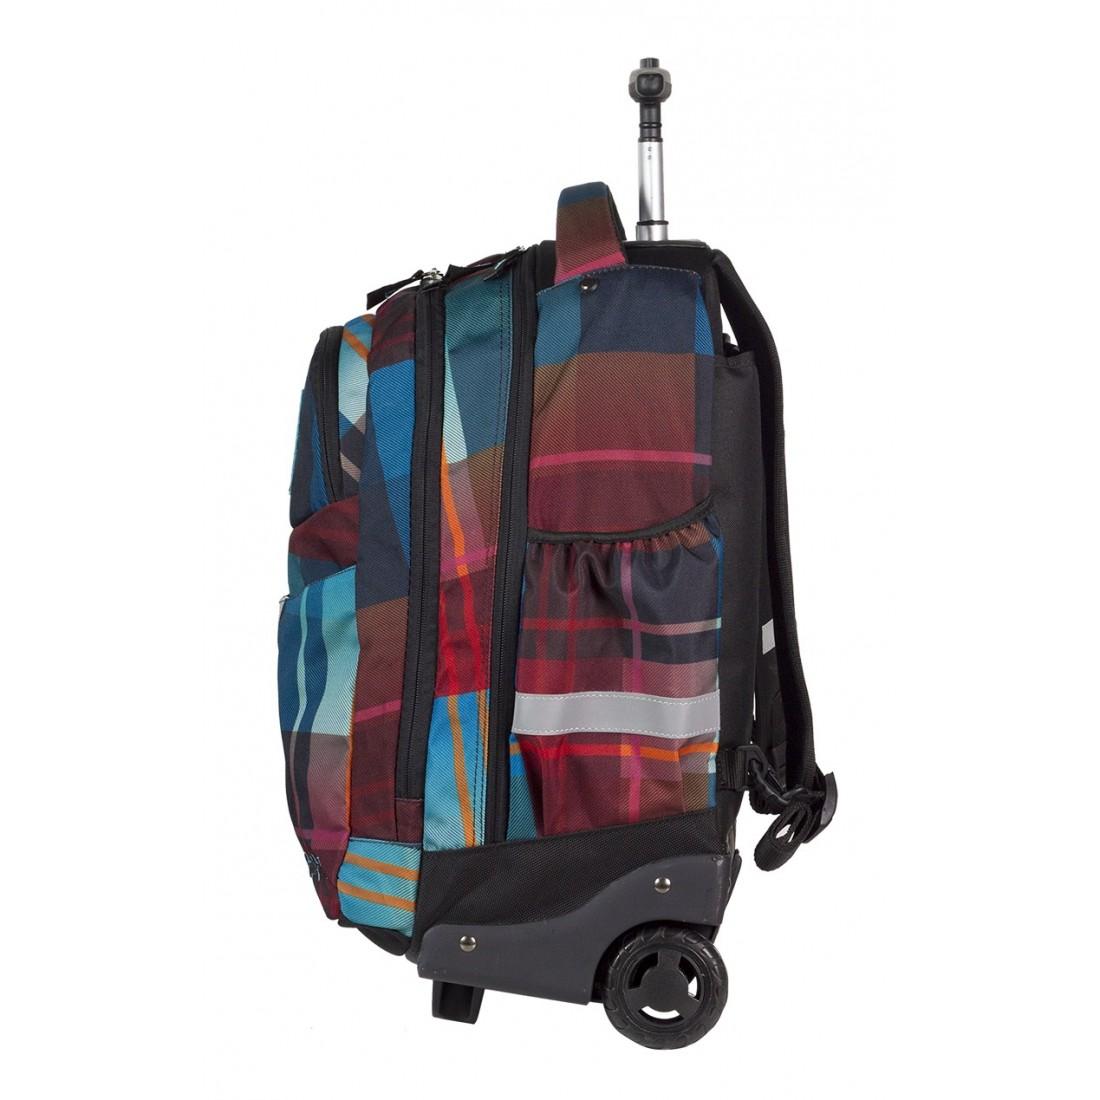 Plecak na kółkach CoolPack CP bordowo niebieski RAPID MAROON 462 - plecak-tornister.pl